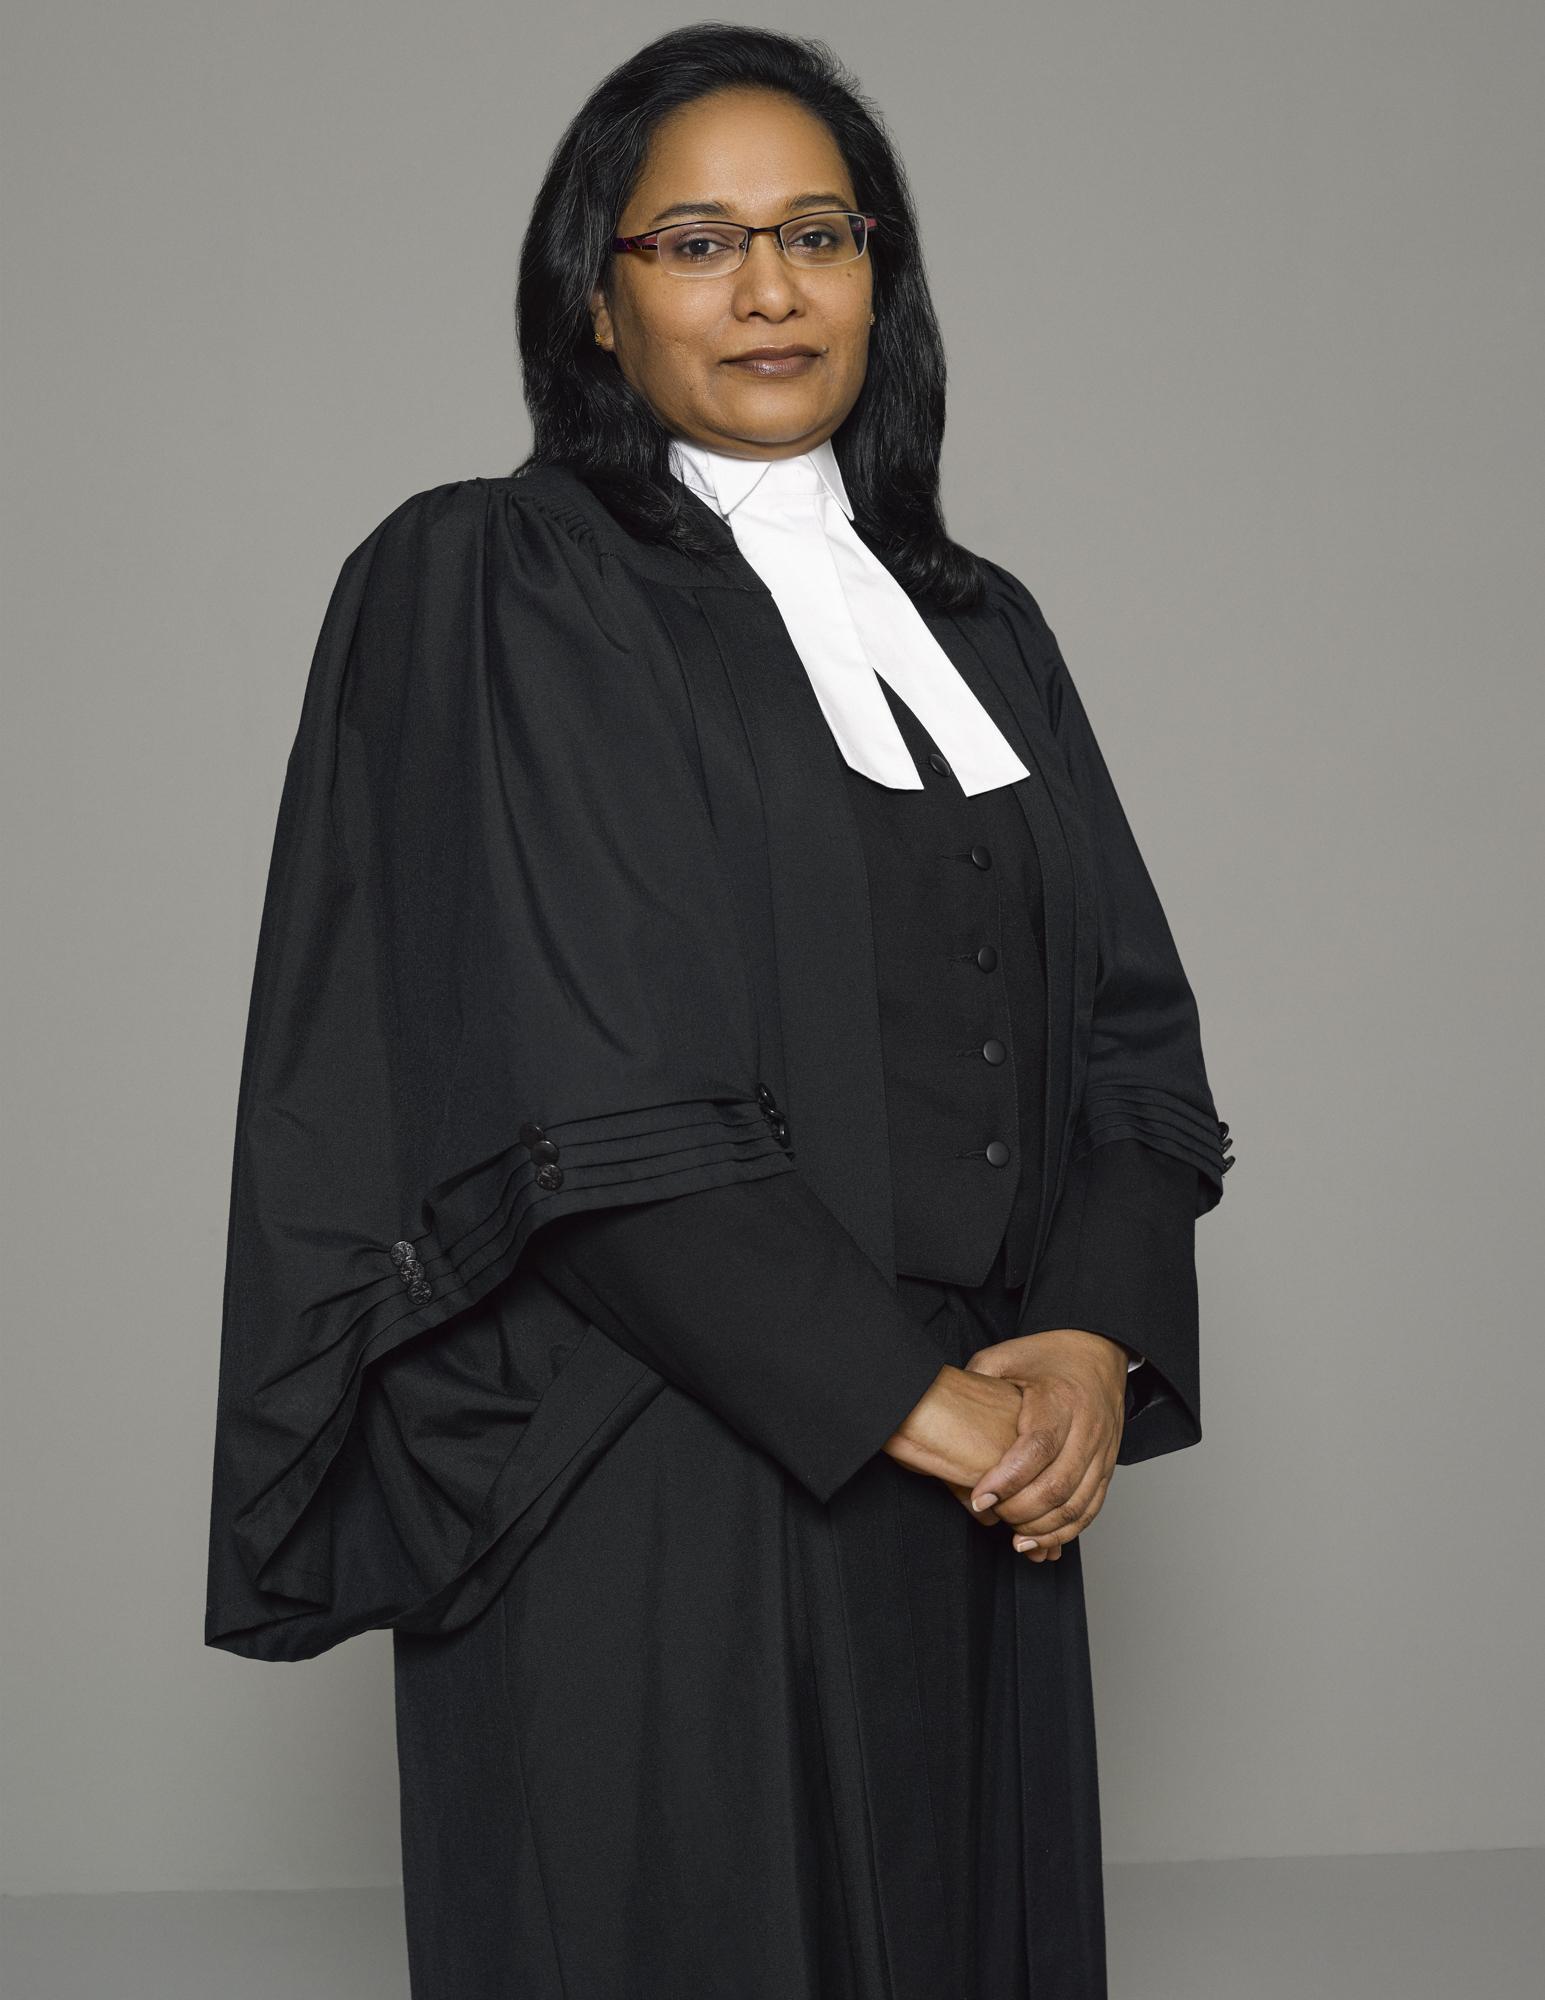 Call to Bar Professional Graduation Portrait